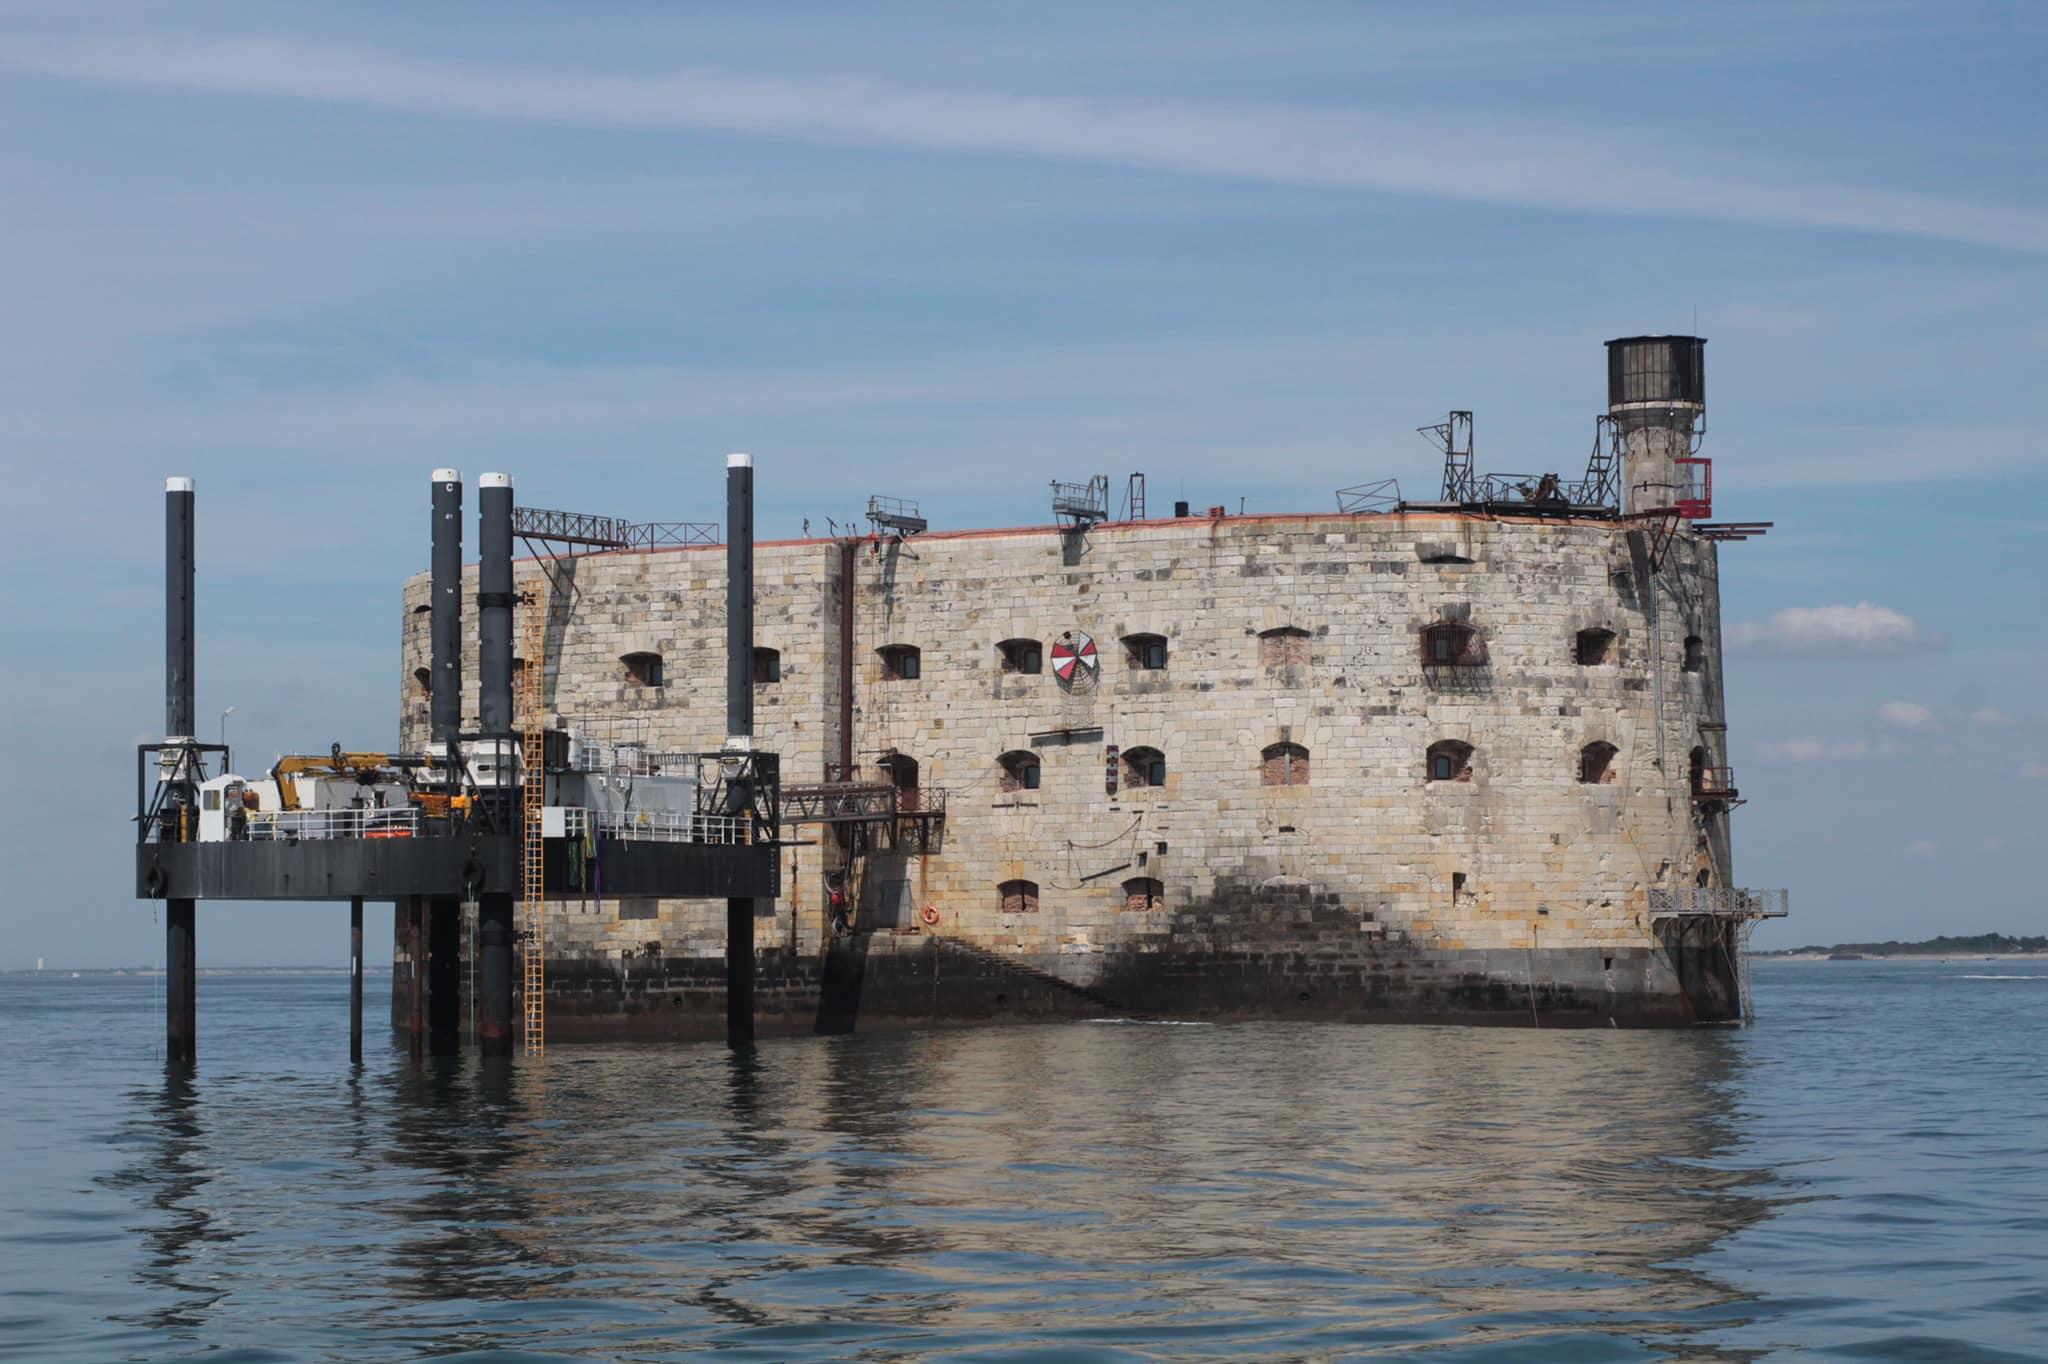 Photos des tournages Fort Boyard 2021 (production + candidats) - Page 6 18412710